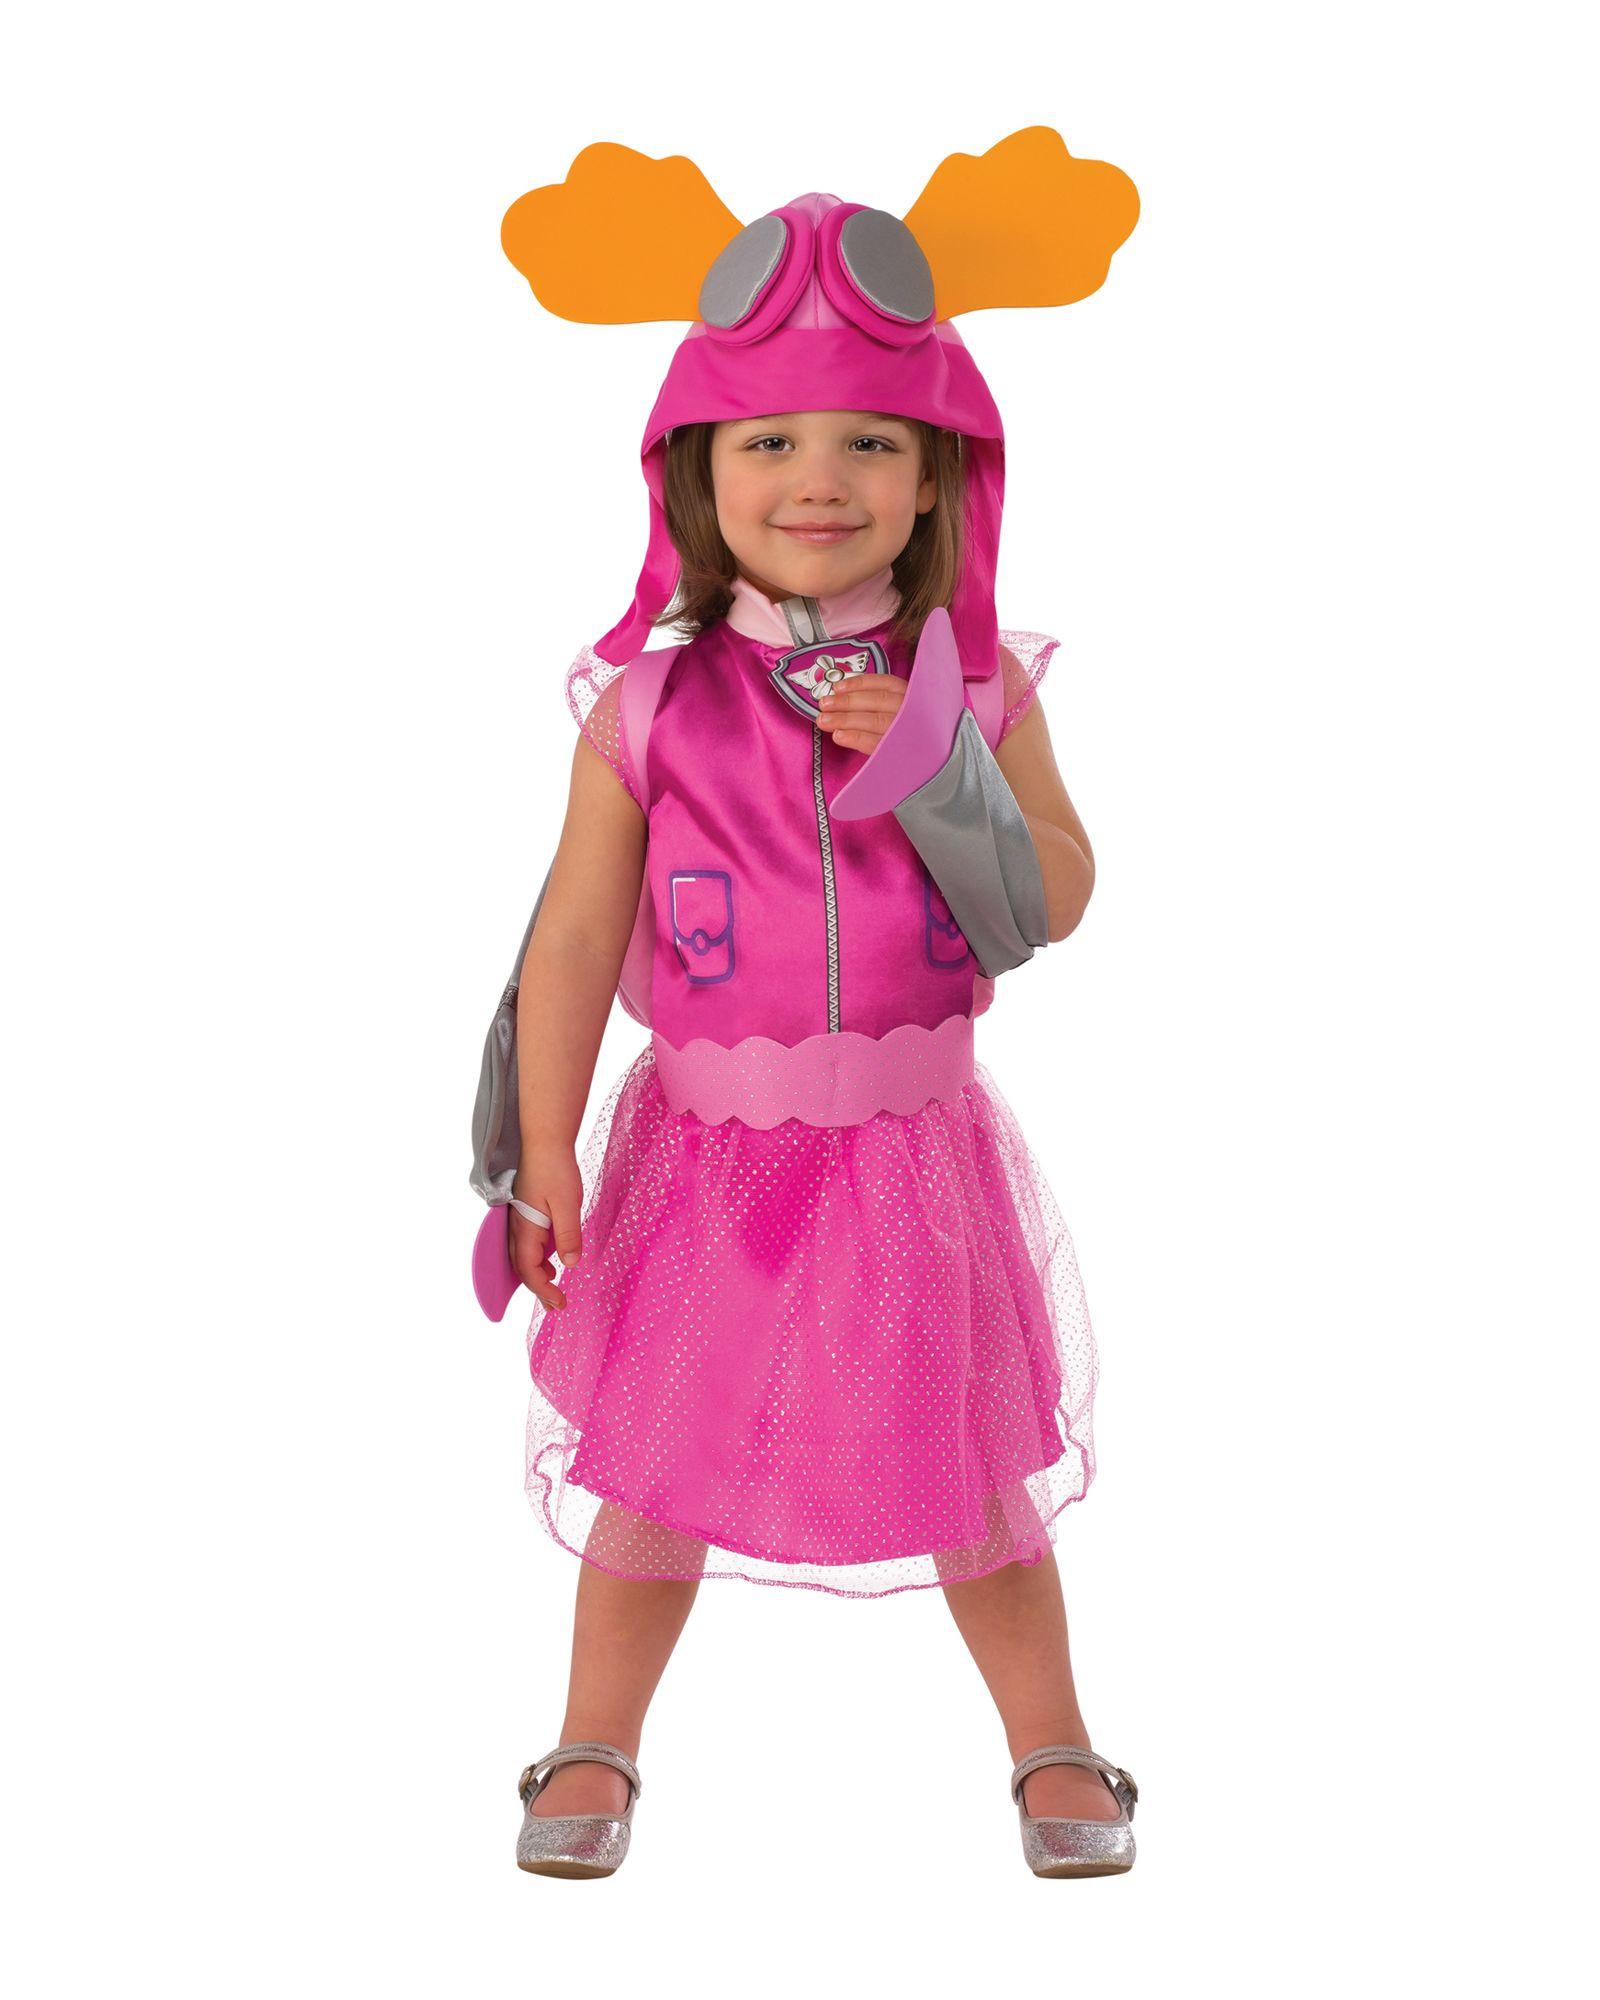 ca09c0ac9983f Girls 3T-4T) Paw Patrol Skye Costume   *Home & Garden*   Skye paw ...